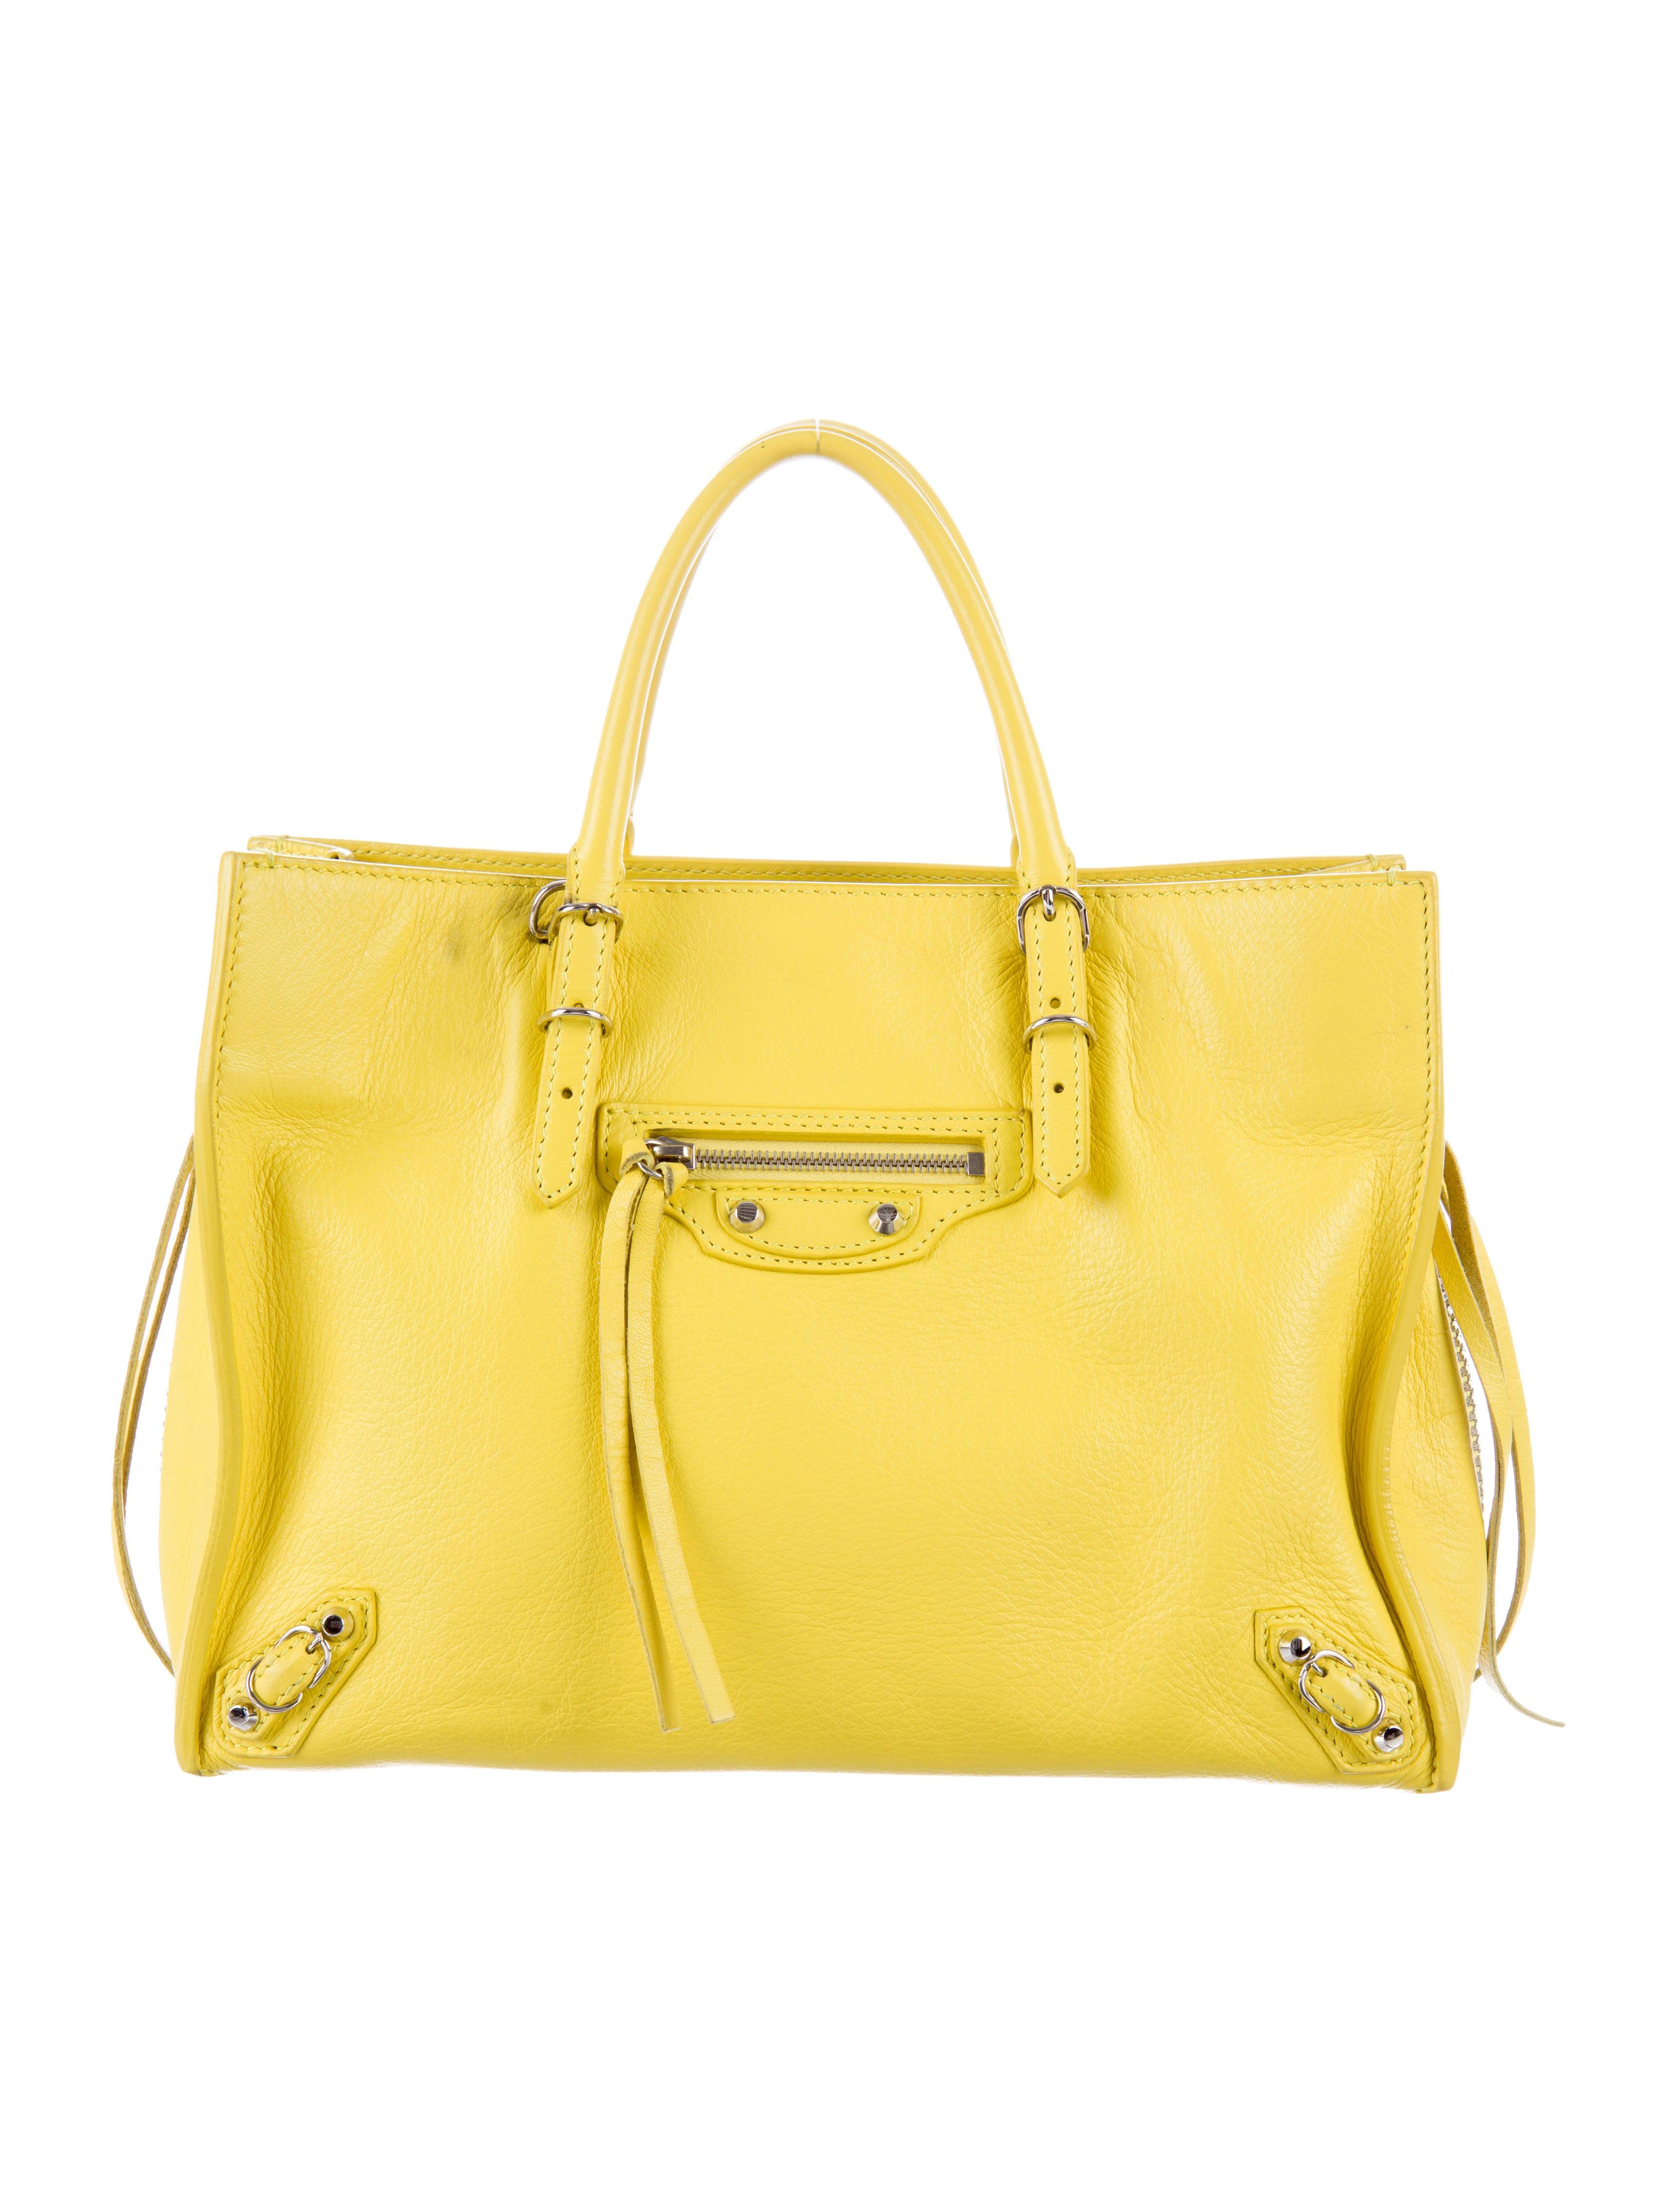 368abbffbc63 Balenciaga Mini Papier A4 Zip Around Crossbody Bag - Handbags ...